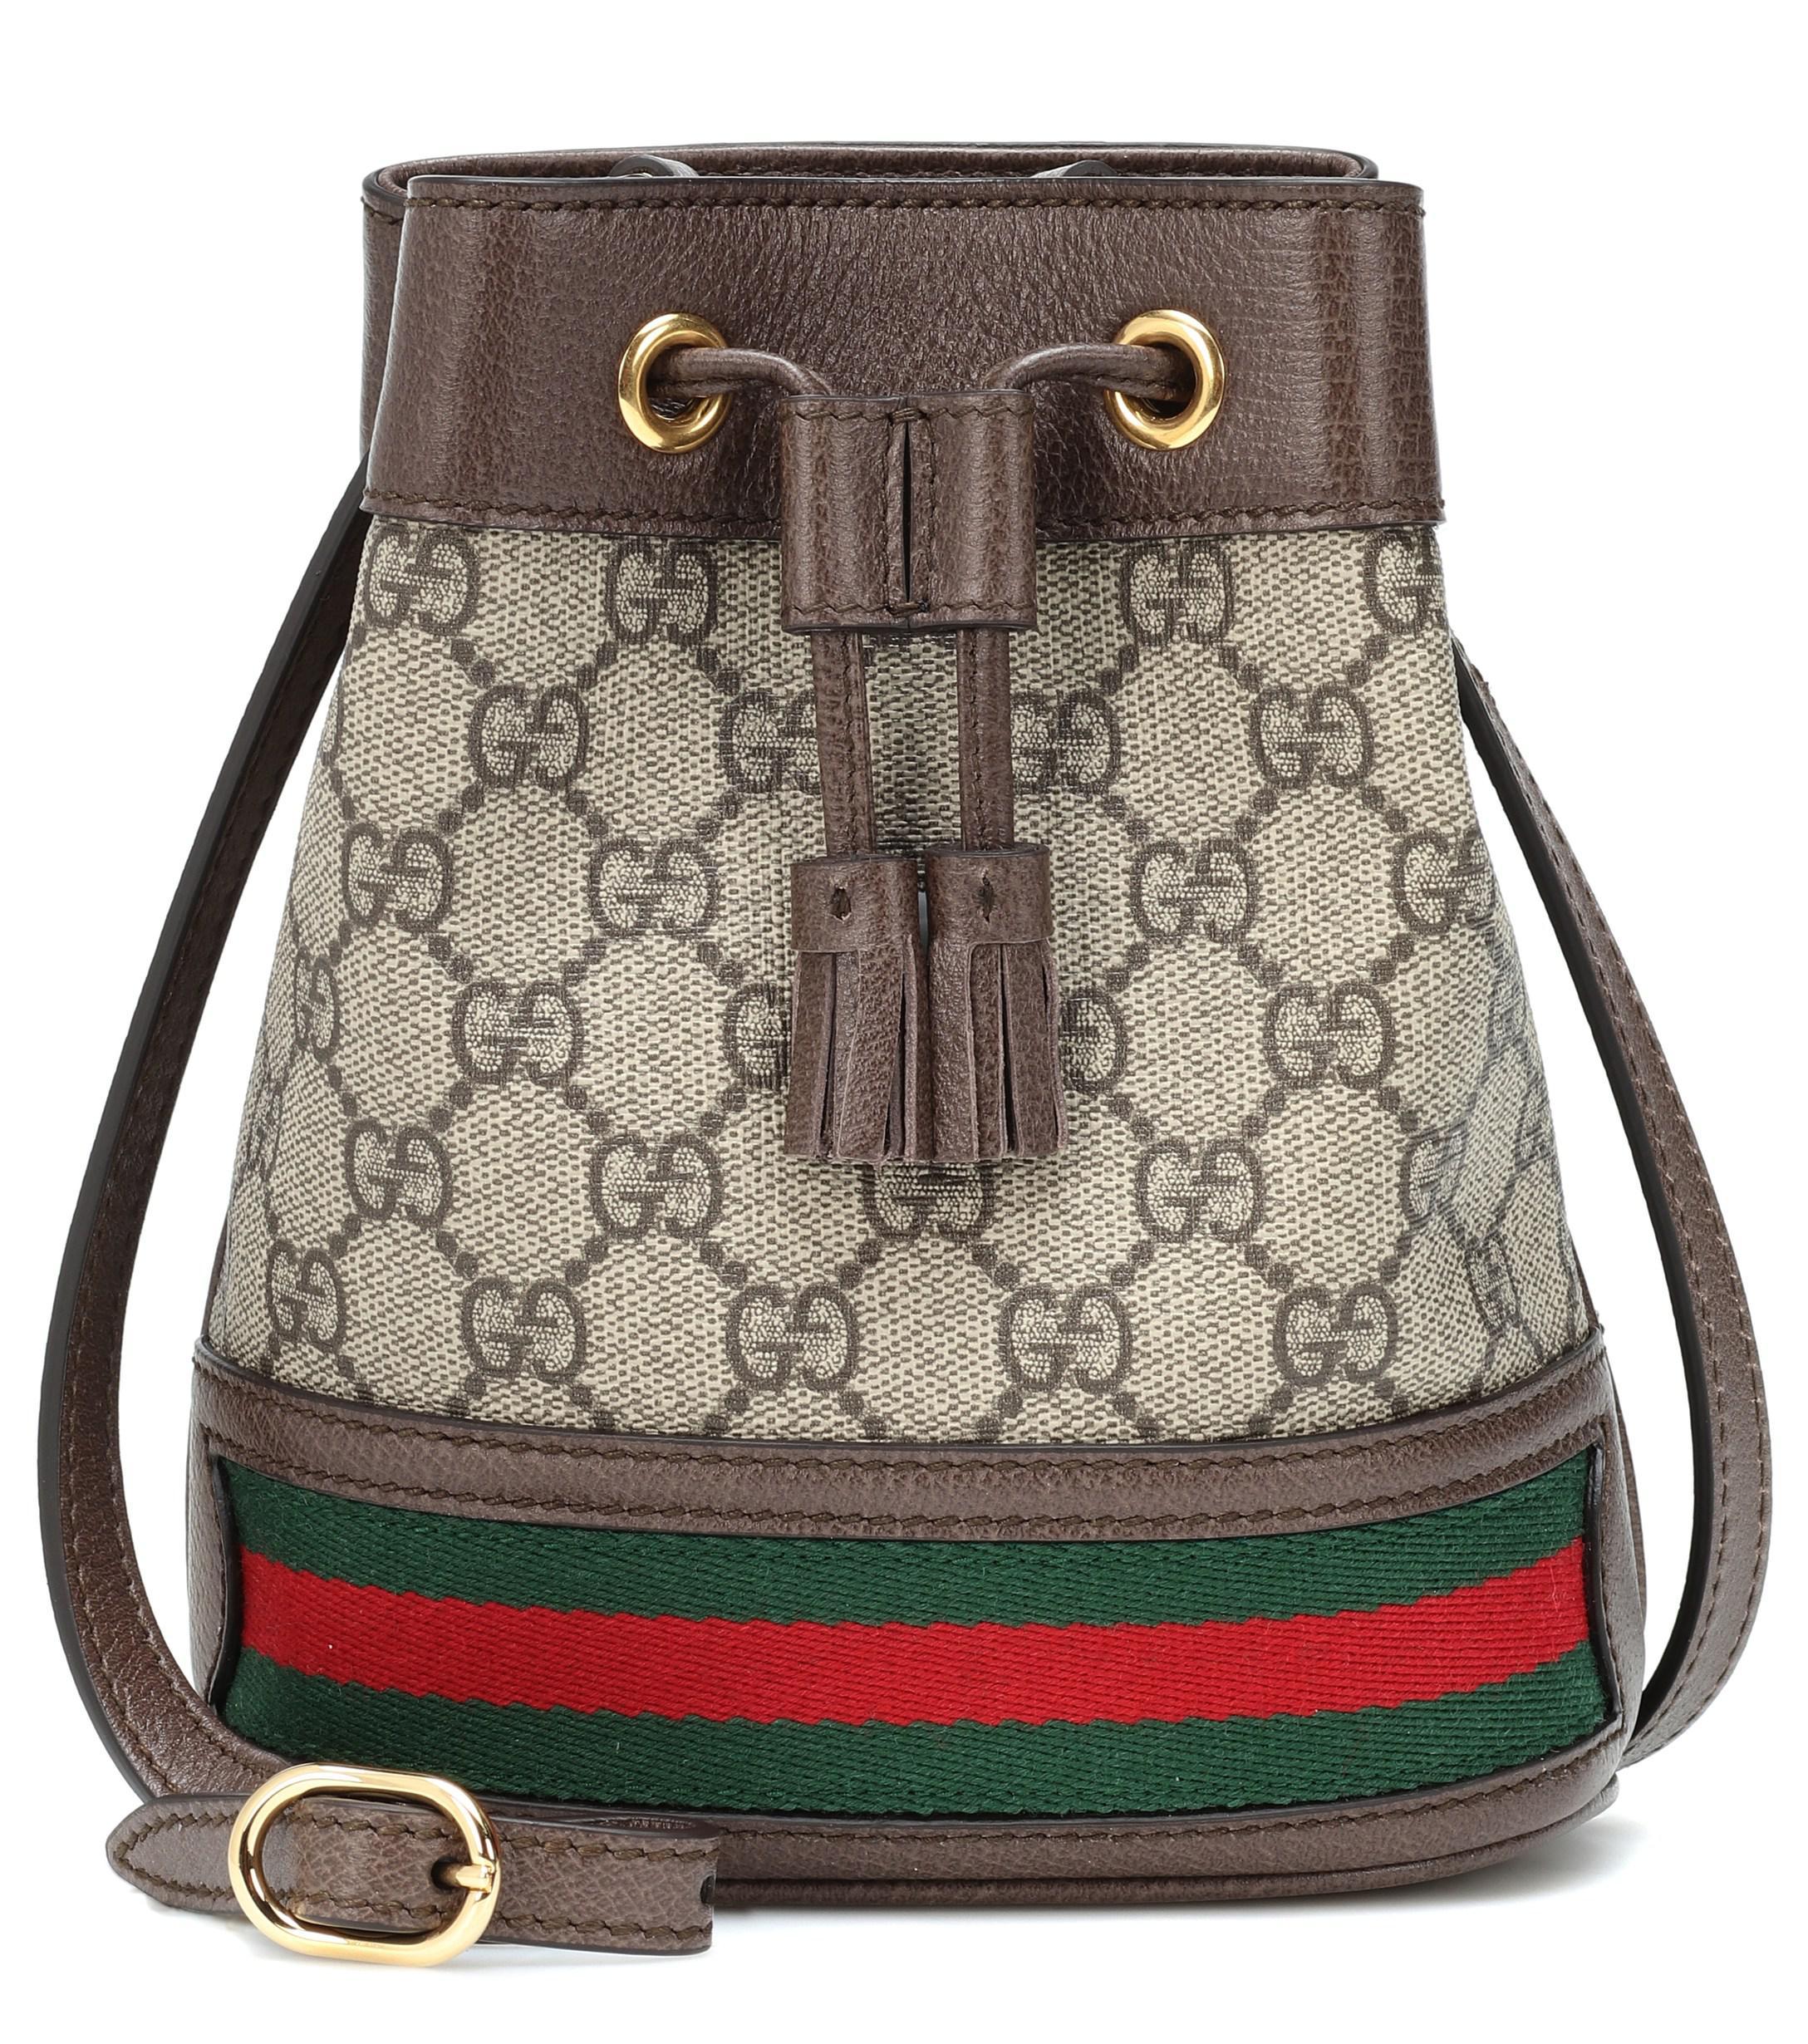 51d693a49a1f Gucci Ophidia GG Mini Bucket Bag - Save 21% - Lyst